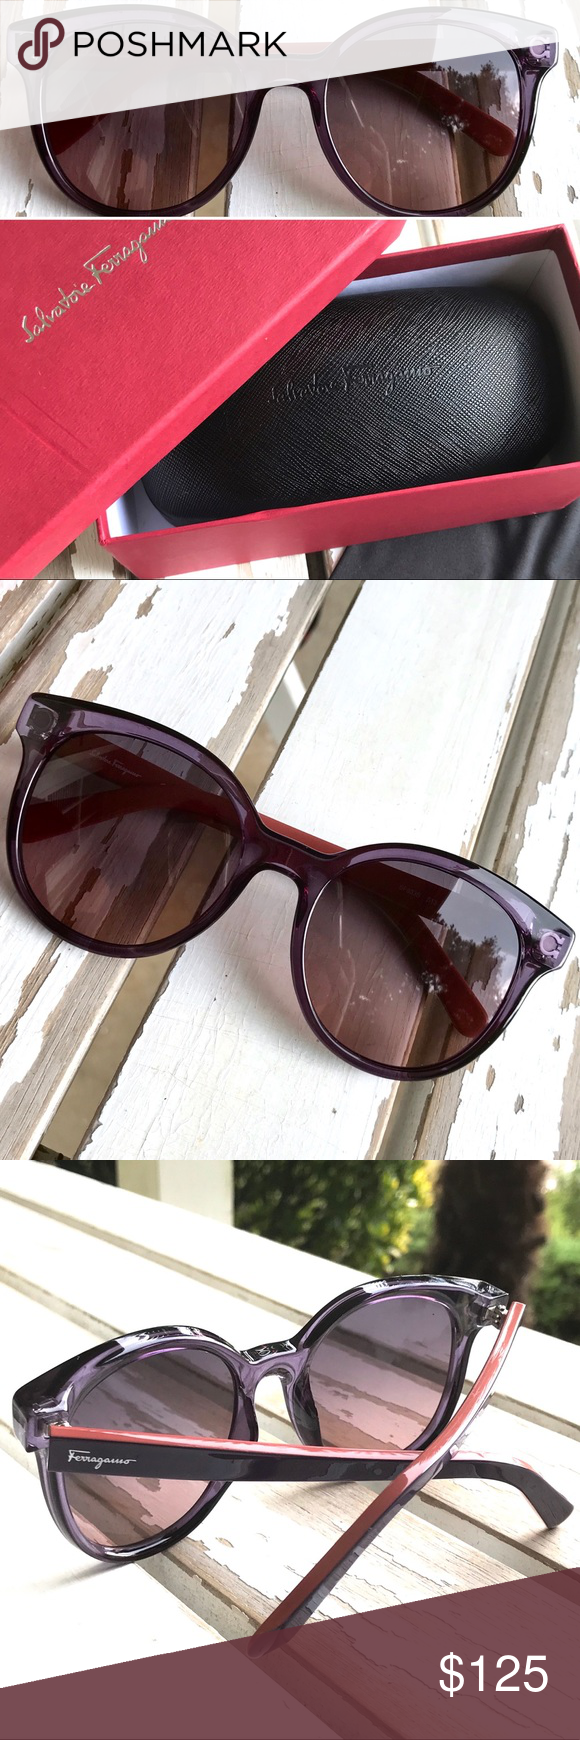 b1698b321 NIB - SALVATORE FERRAGAMO Sunglasses + Case Authentic SALVATORE FERRAGAMO  Sunglasses • Model: SF833S • Color: 513 - Purple/Pink (like a salmon-pink)  • Size: ...